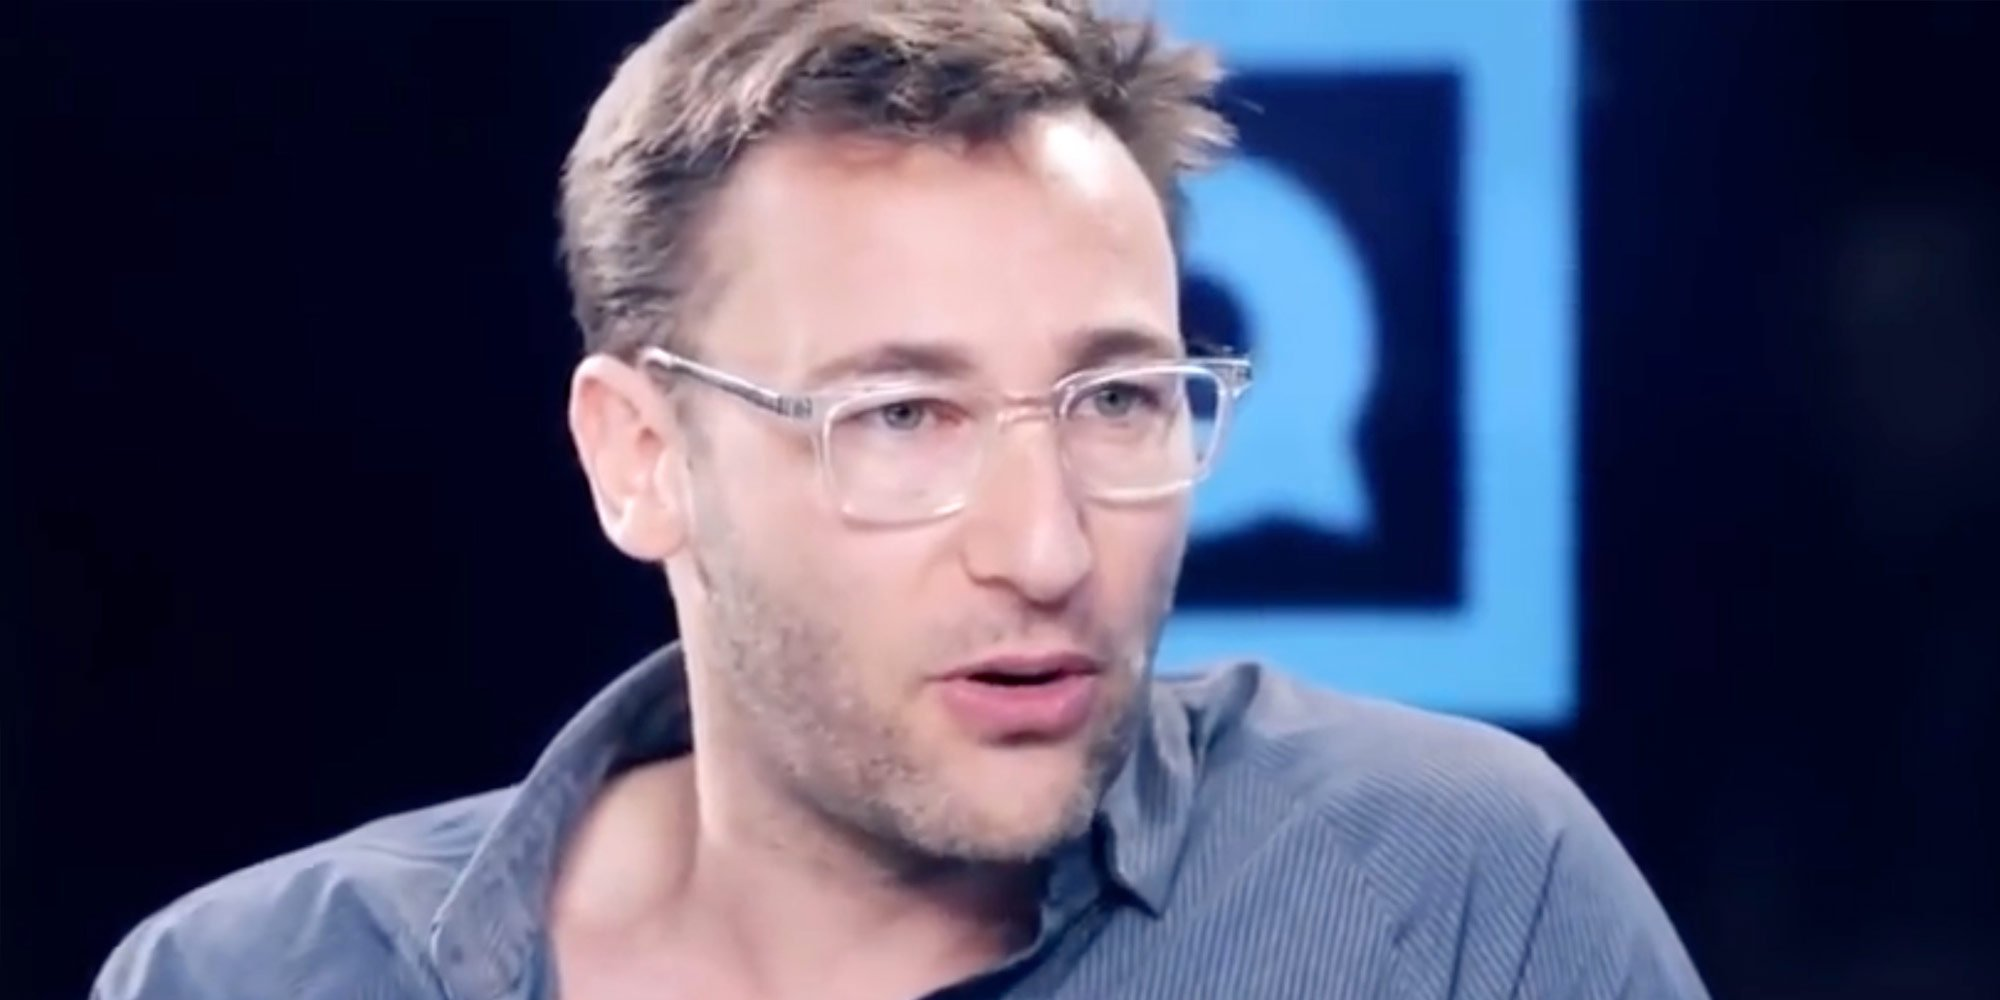 Simon Sinek: i Millennials? Narcisisti, pigri ed egoisti